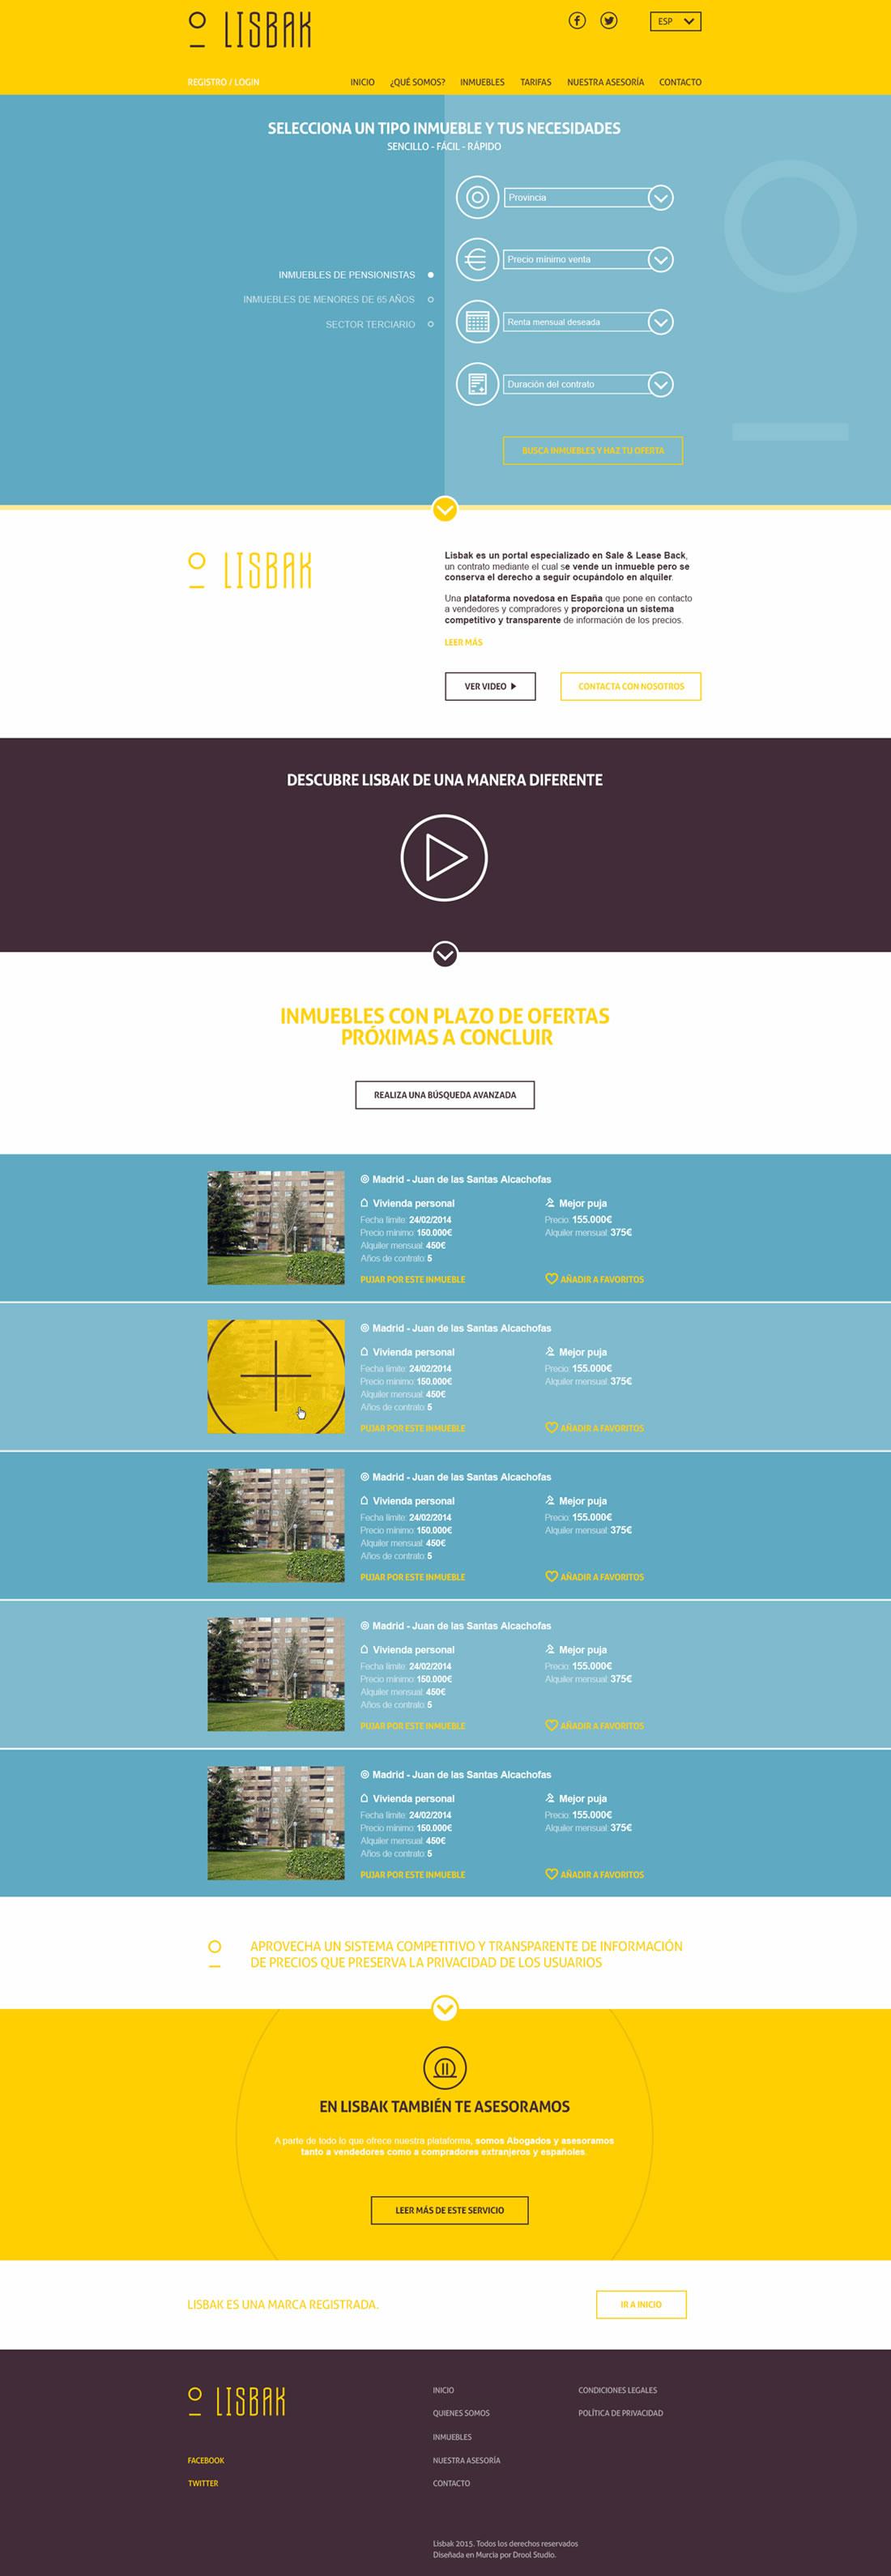 Diseño web Lisbak por Drool estudio creativo - 7